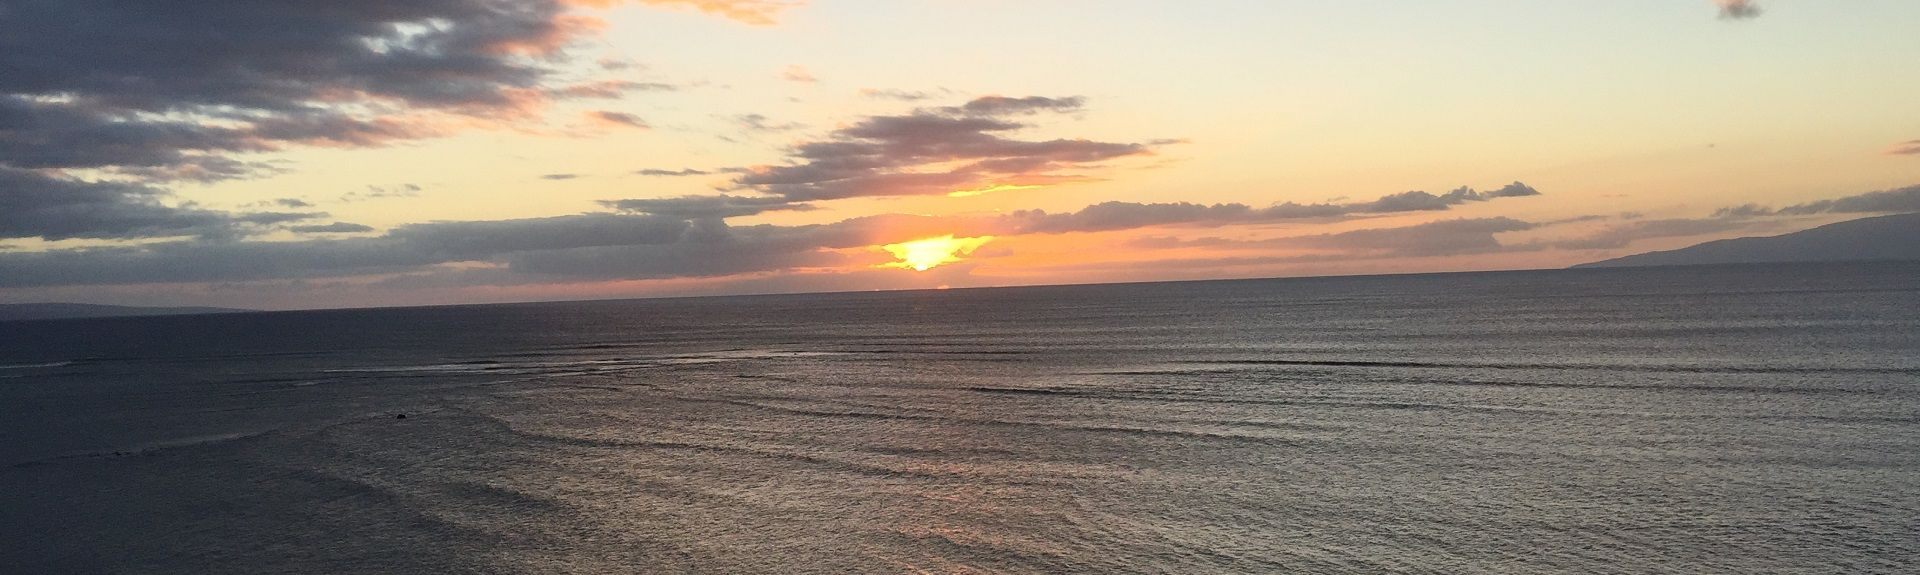 Menehune Shores (Kihei, Hawaii, United States)